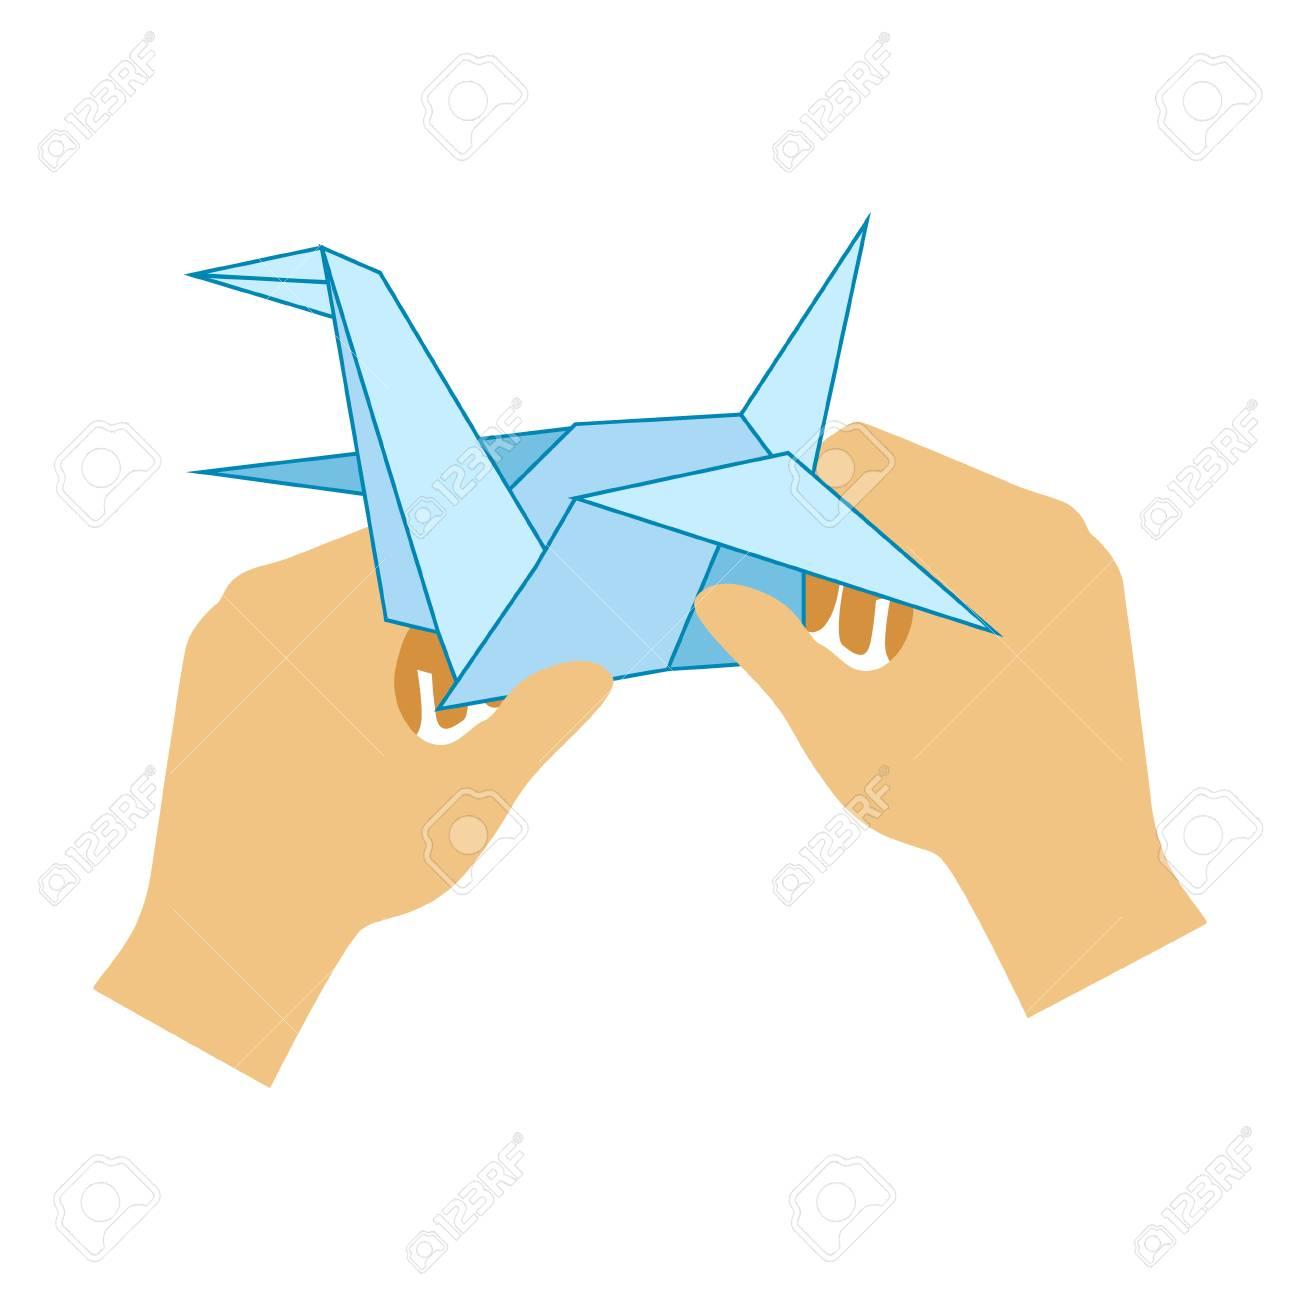 two hands doing origami paper crane elementary school art class vector illustration stock vector